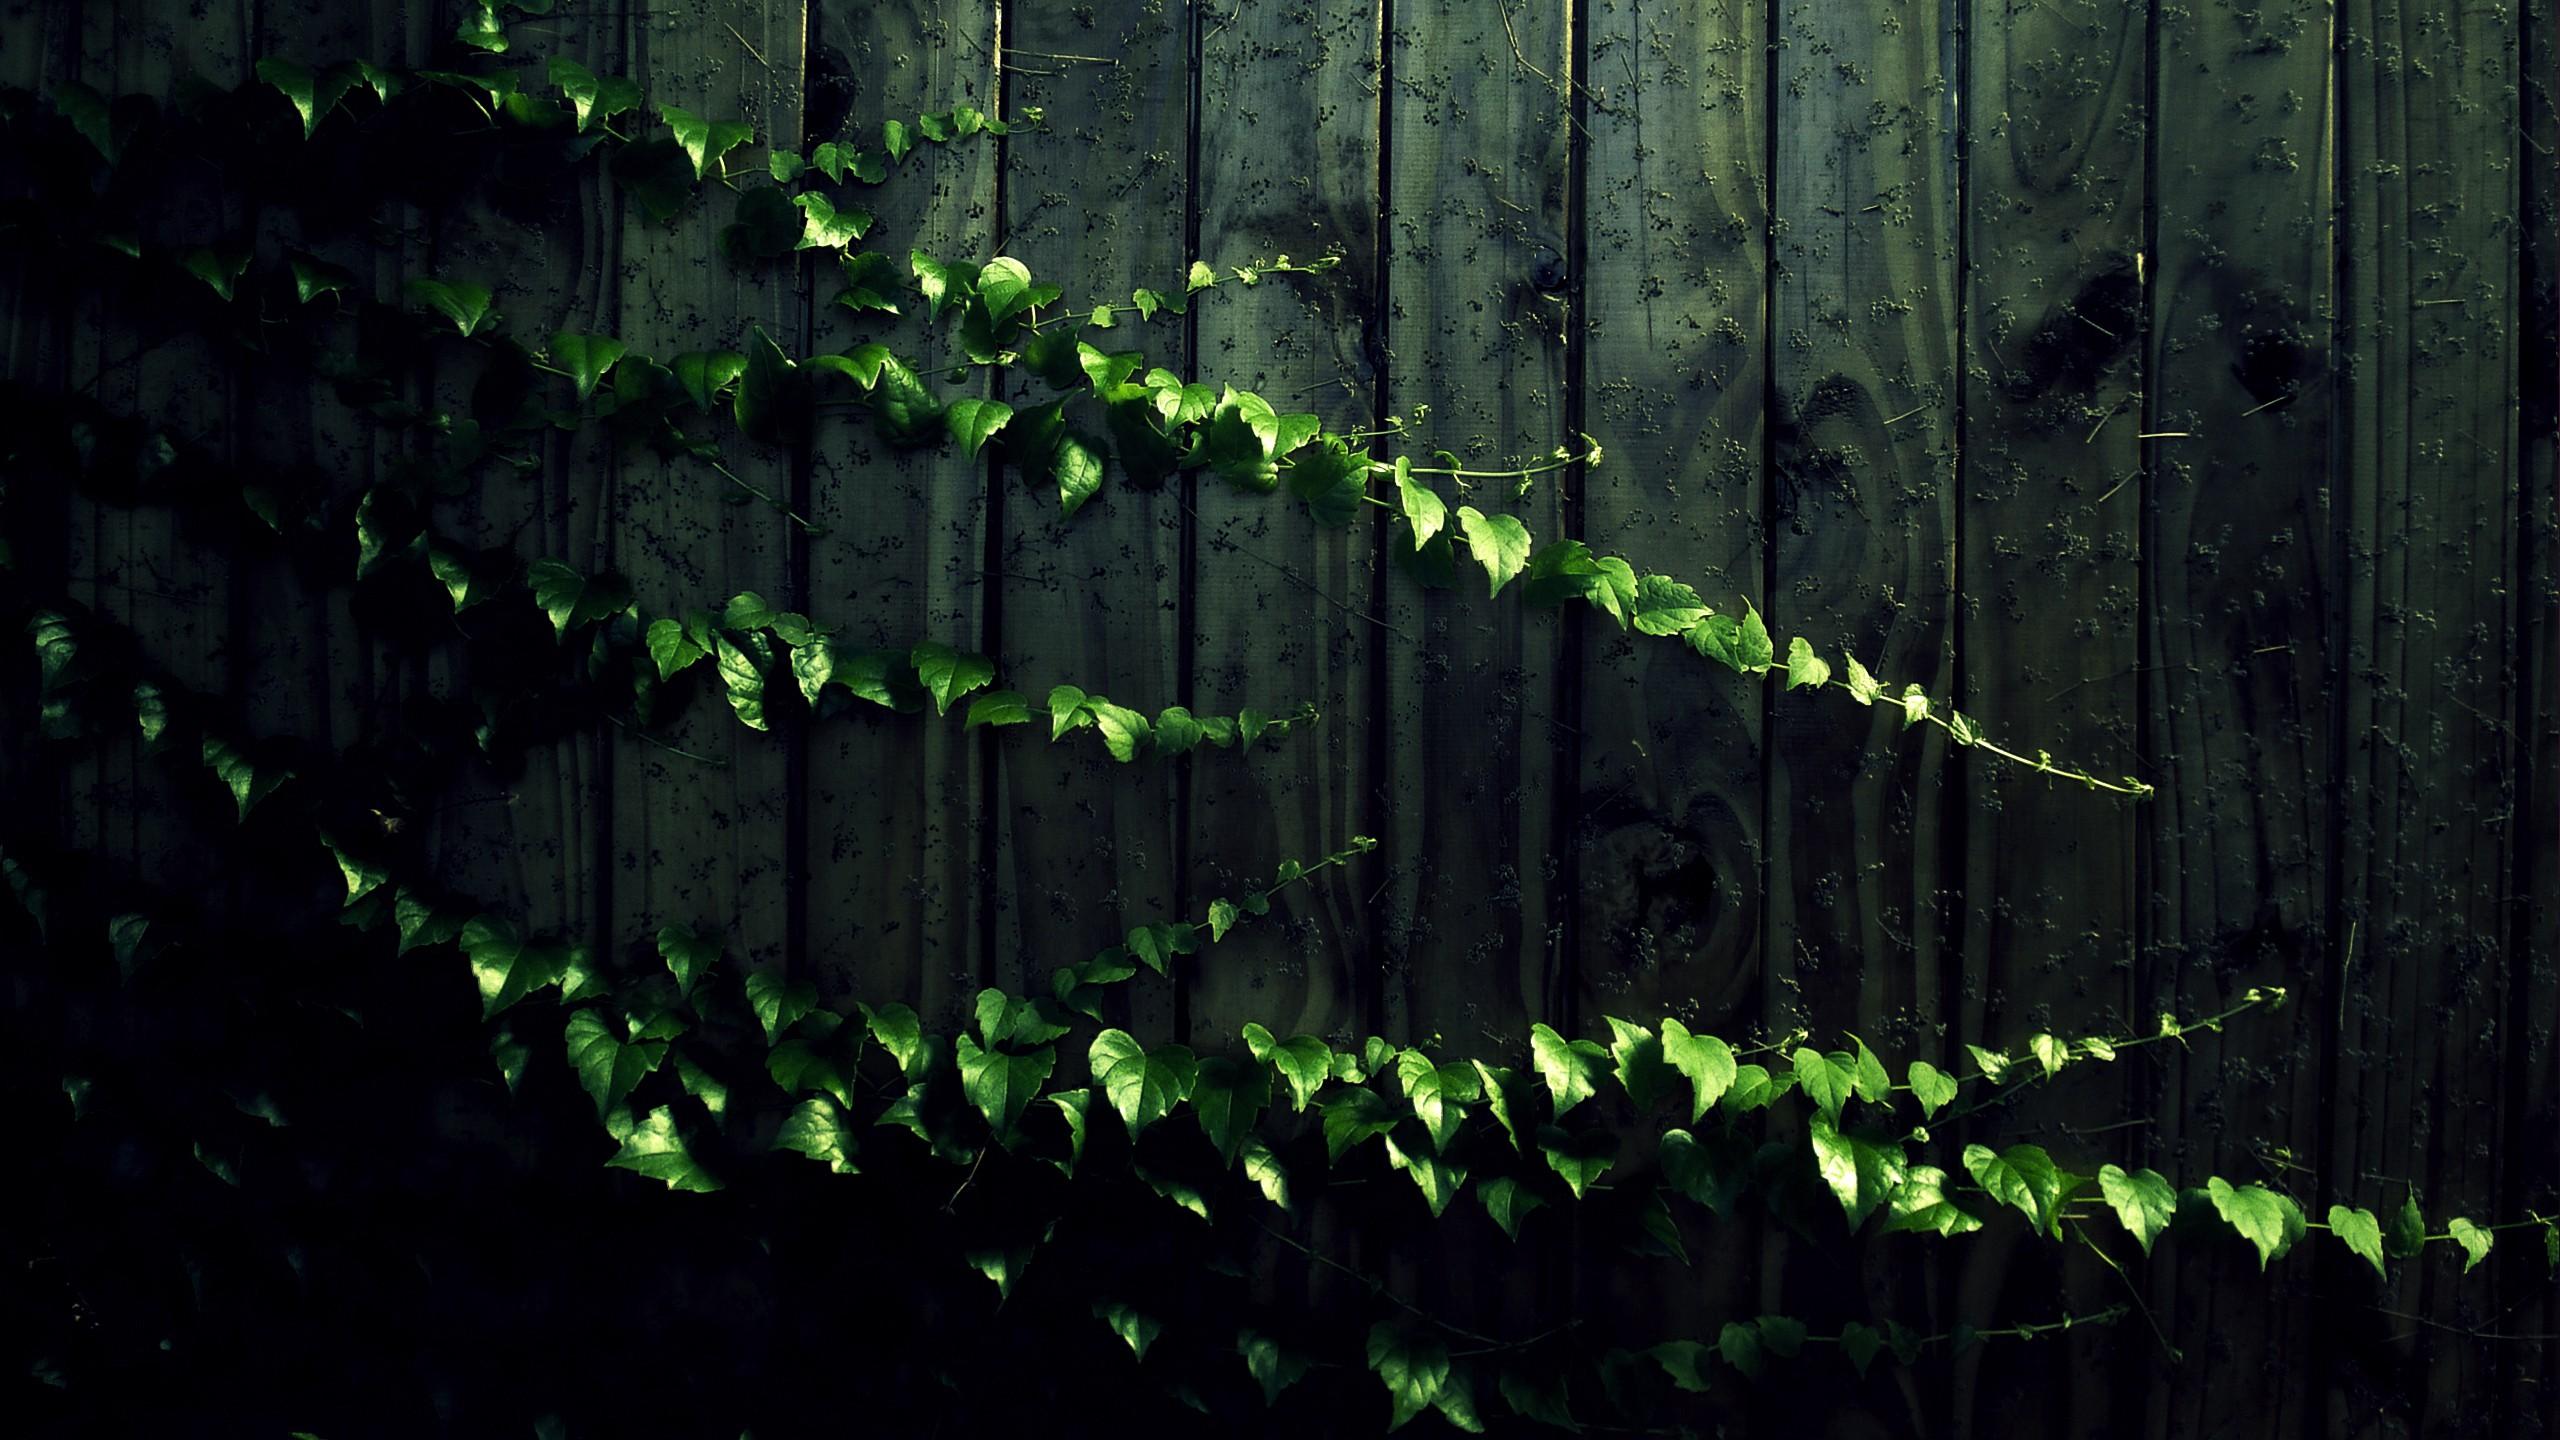 Fence Background Wallpaper : Creeping Vine Computer Wallpapers, Desktop Backgrounds  2560x1440 ...